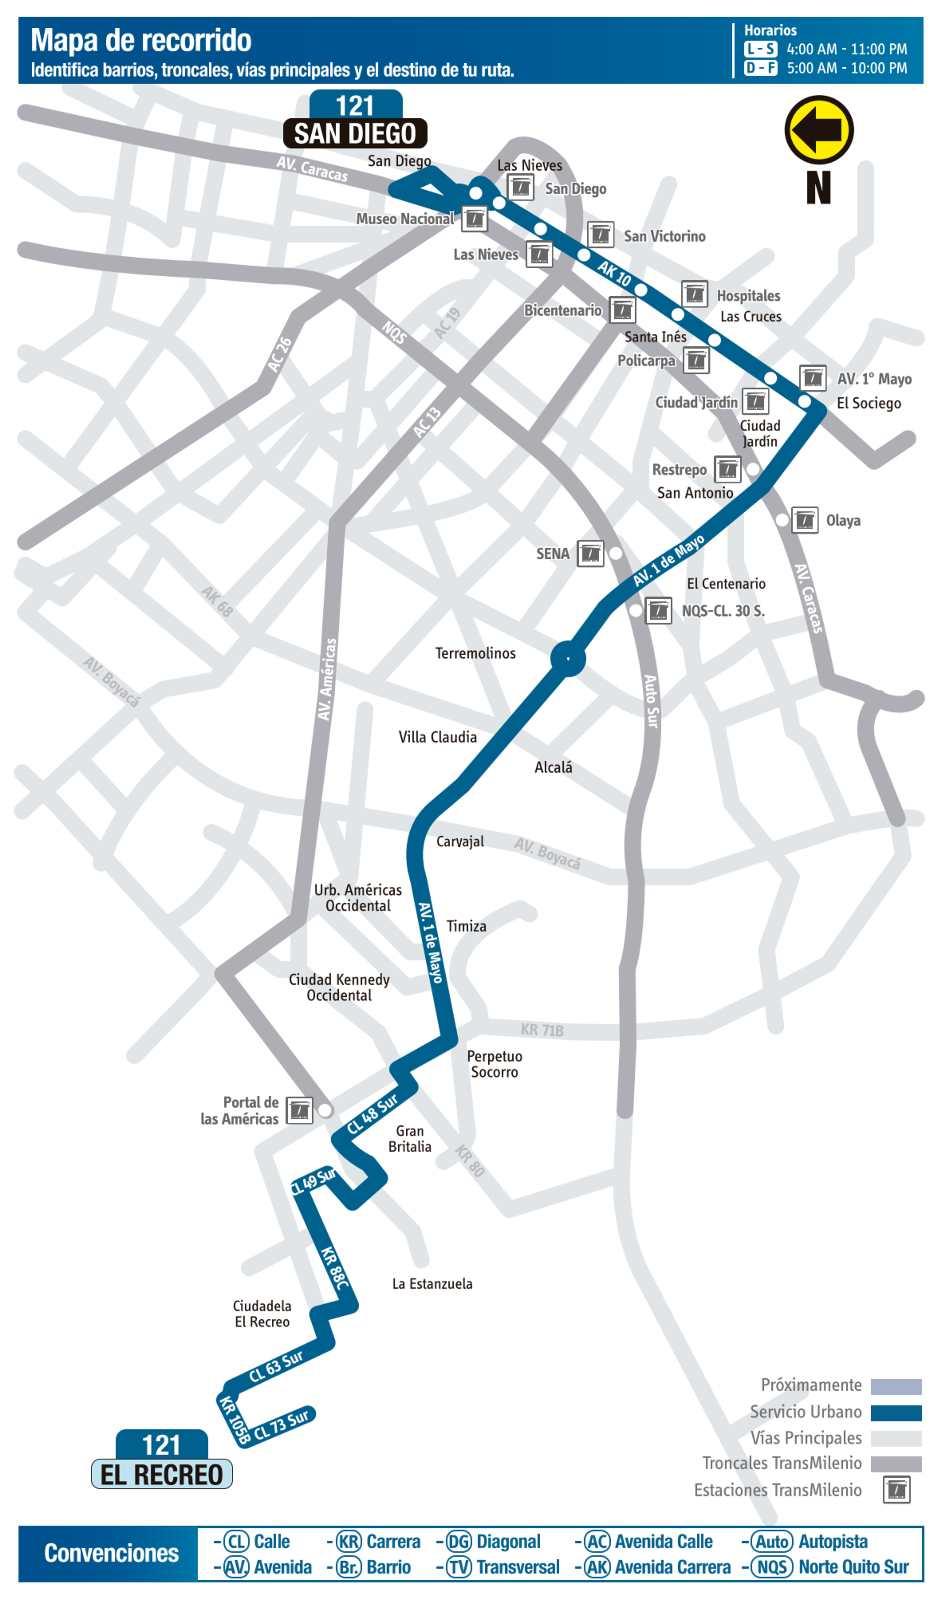 Ruta SITP: 121 El Recreo ↔ San Diego (mapa)